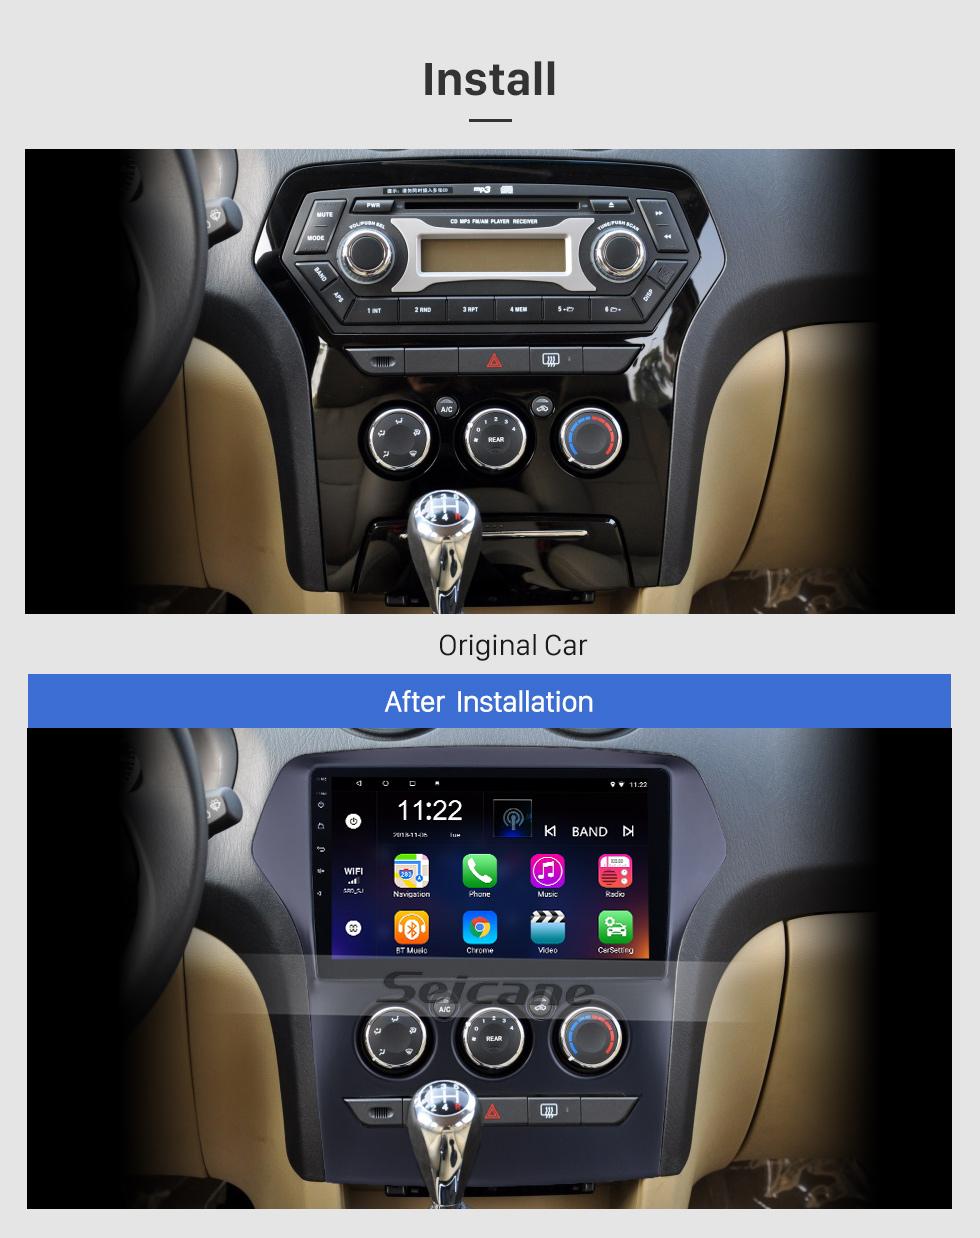 Seicane 10.1 pouces Android 8.1 pour 2011 JMC Old Yusheng Radio Navigation GPS avec écran tactile HD WIFI Bluetooth support Carplay DVR